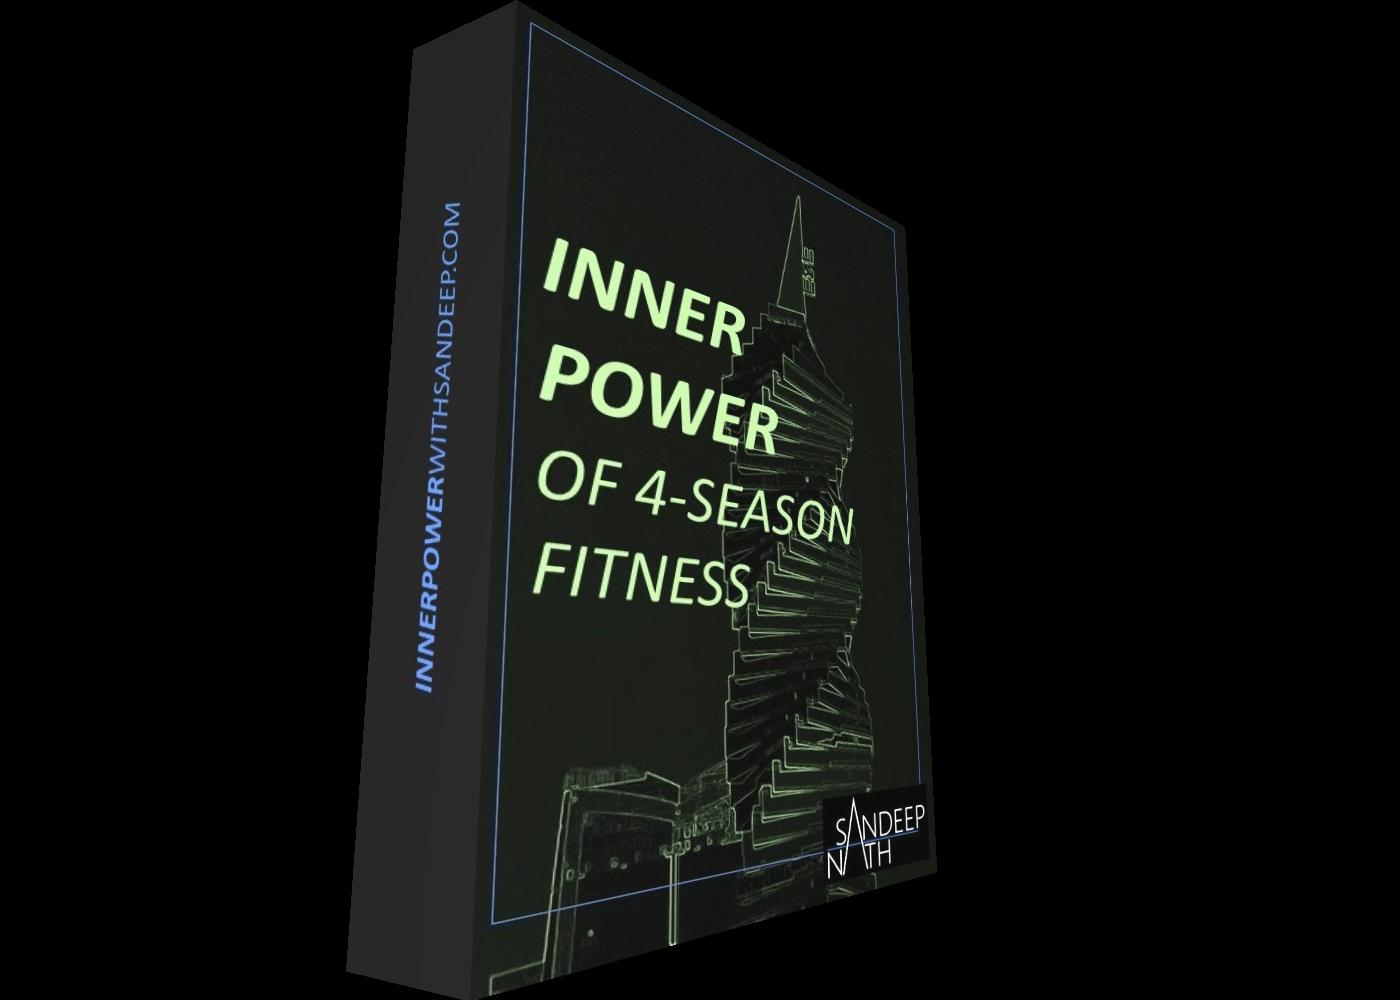 4 season fitness